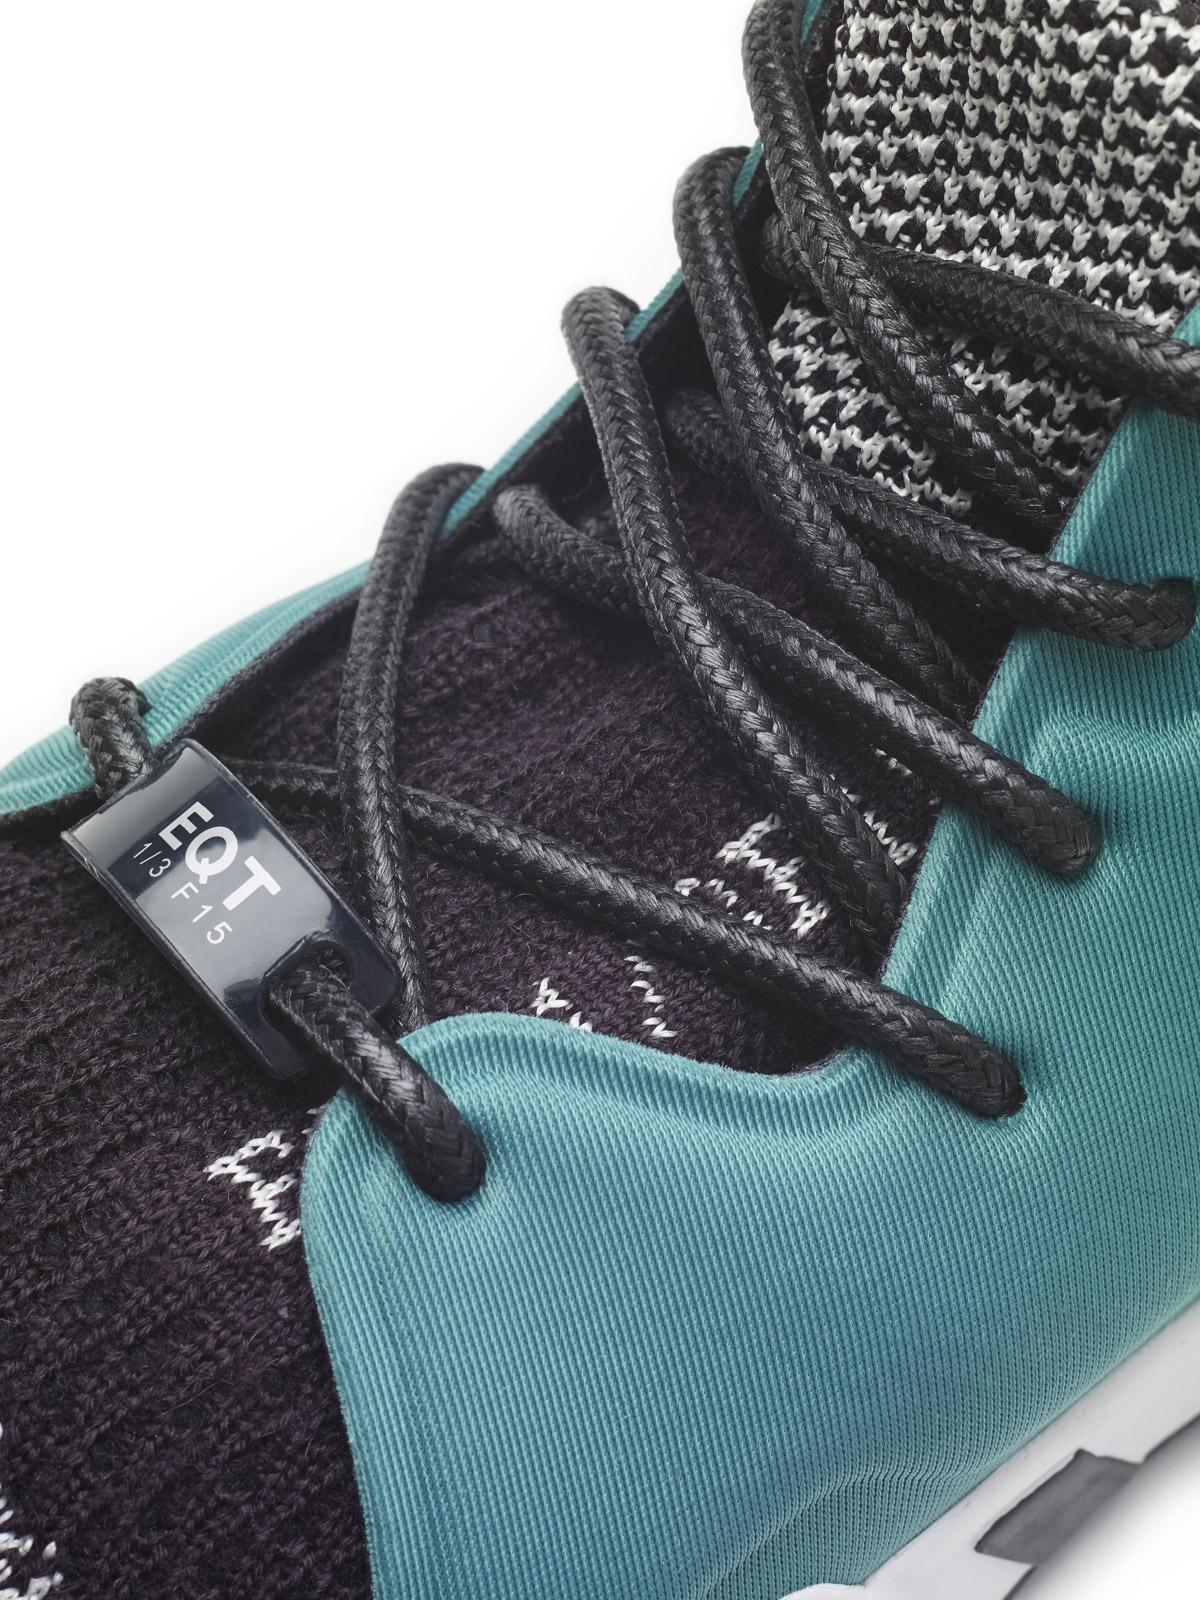 adidas Originals Statement EQT #3F15 Collection-8